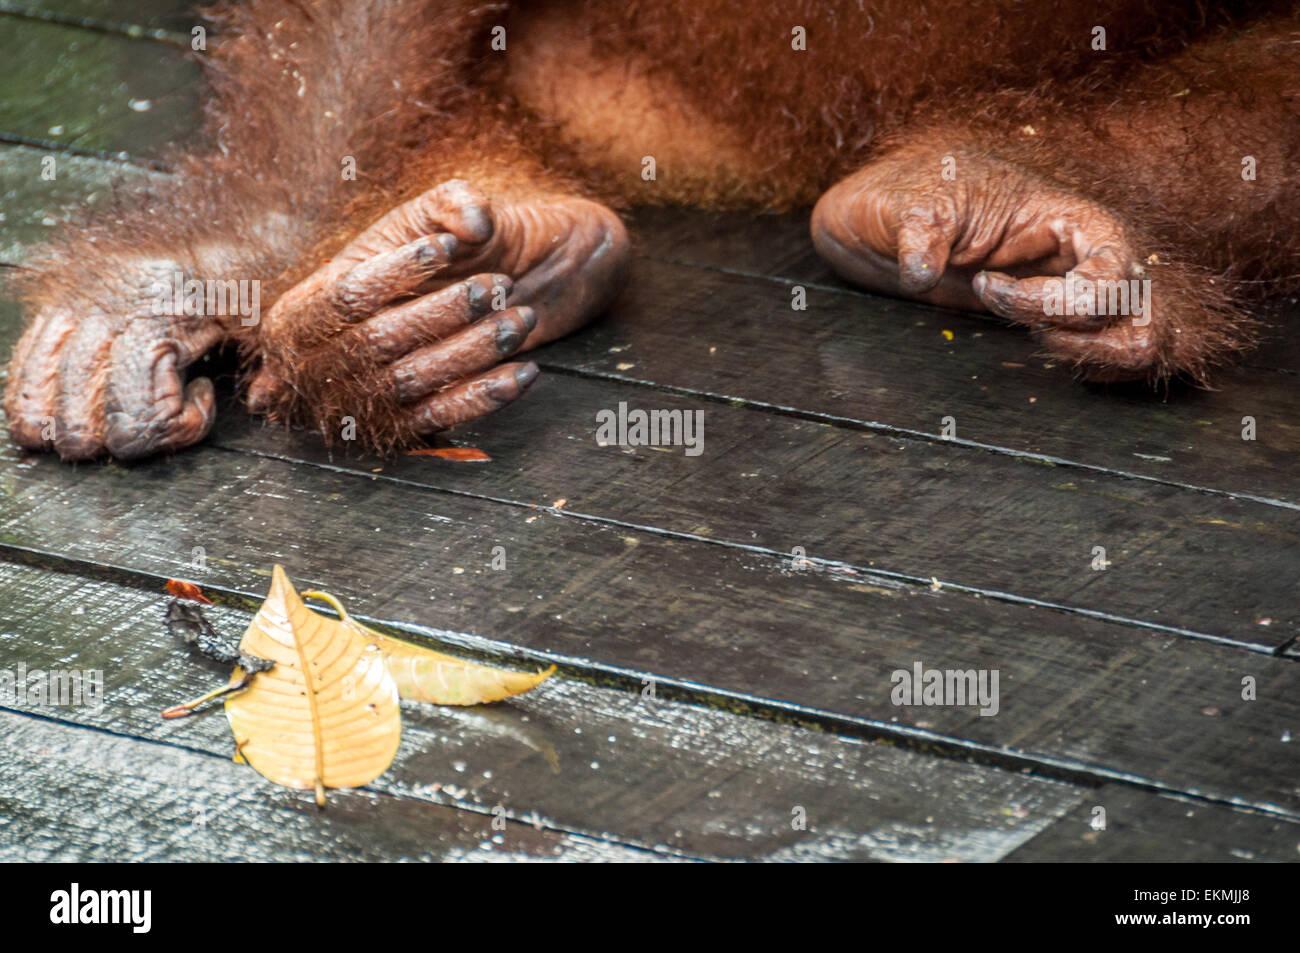 sepilok-orangutan-sanctuary-sabah-borneo-malaysia-EKMJJ8.jpg